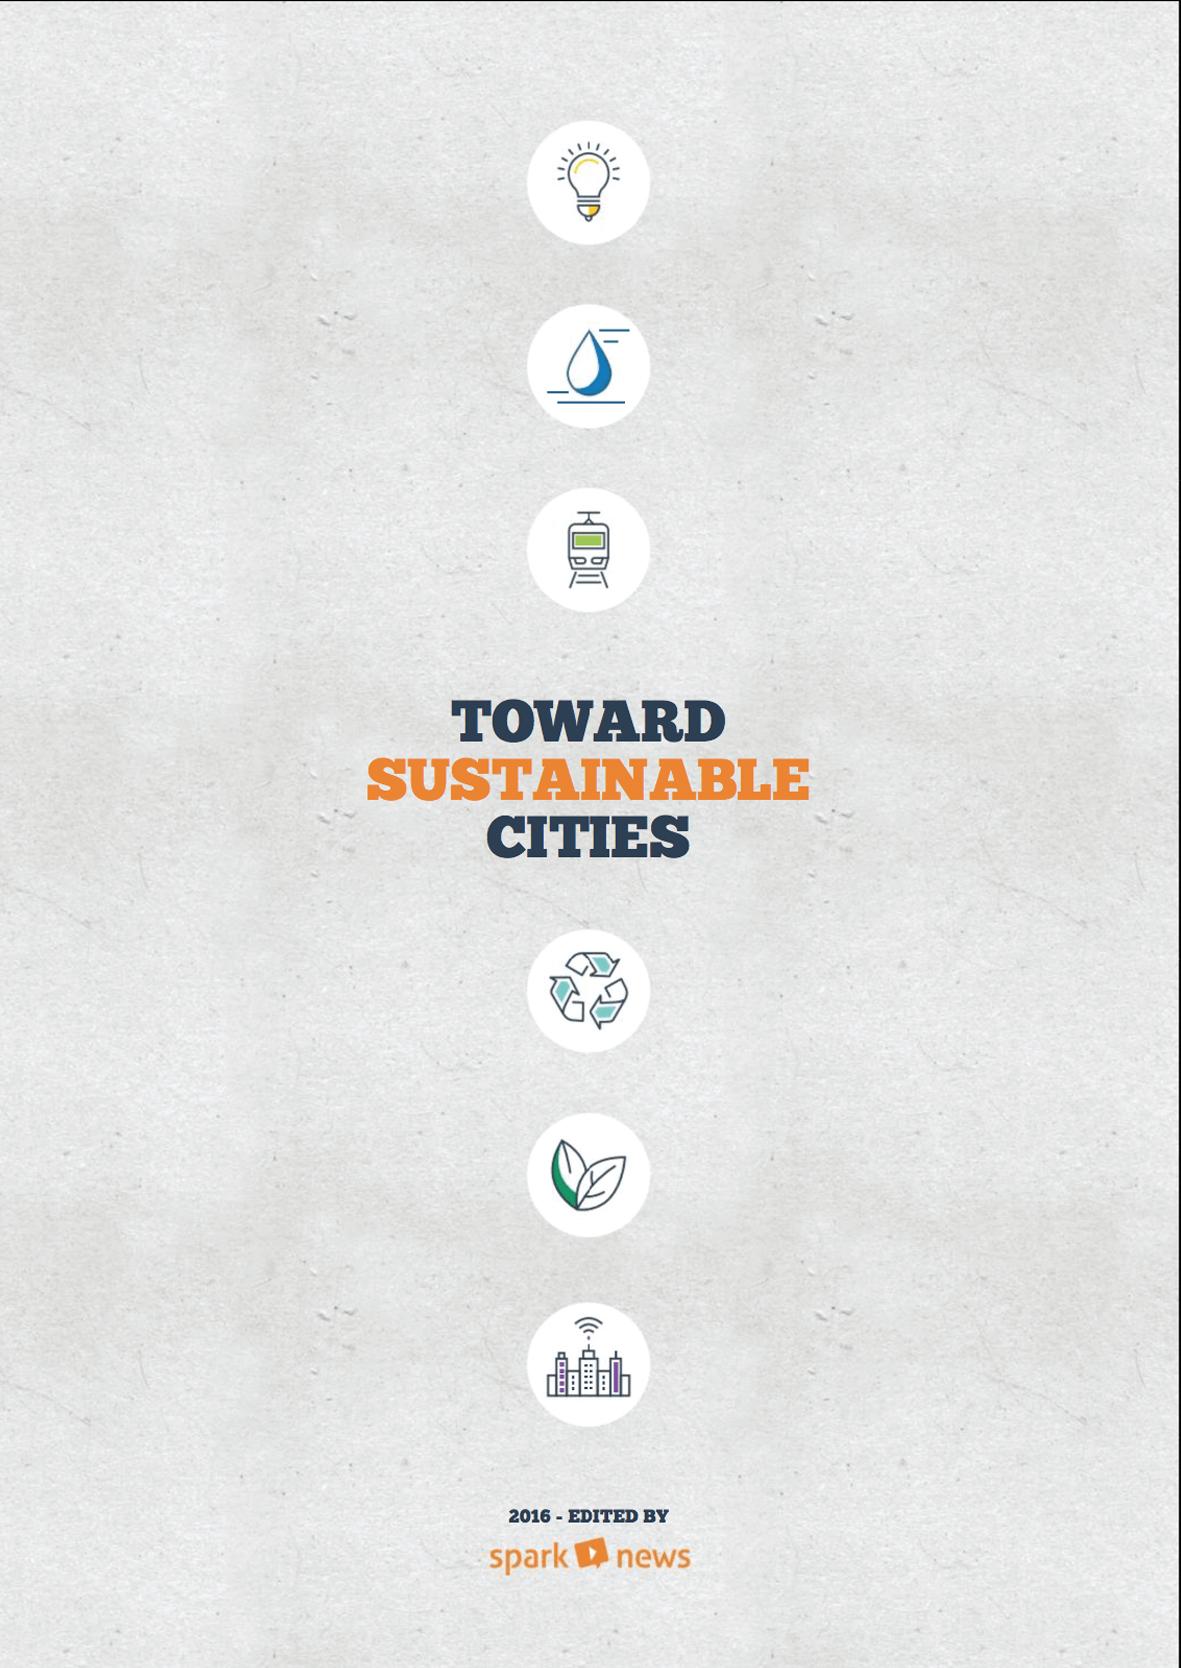 Towards Sustainable Cities